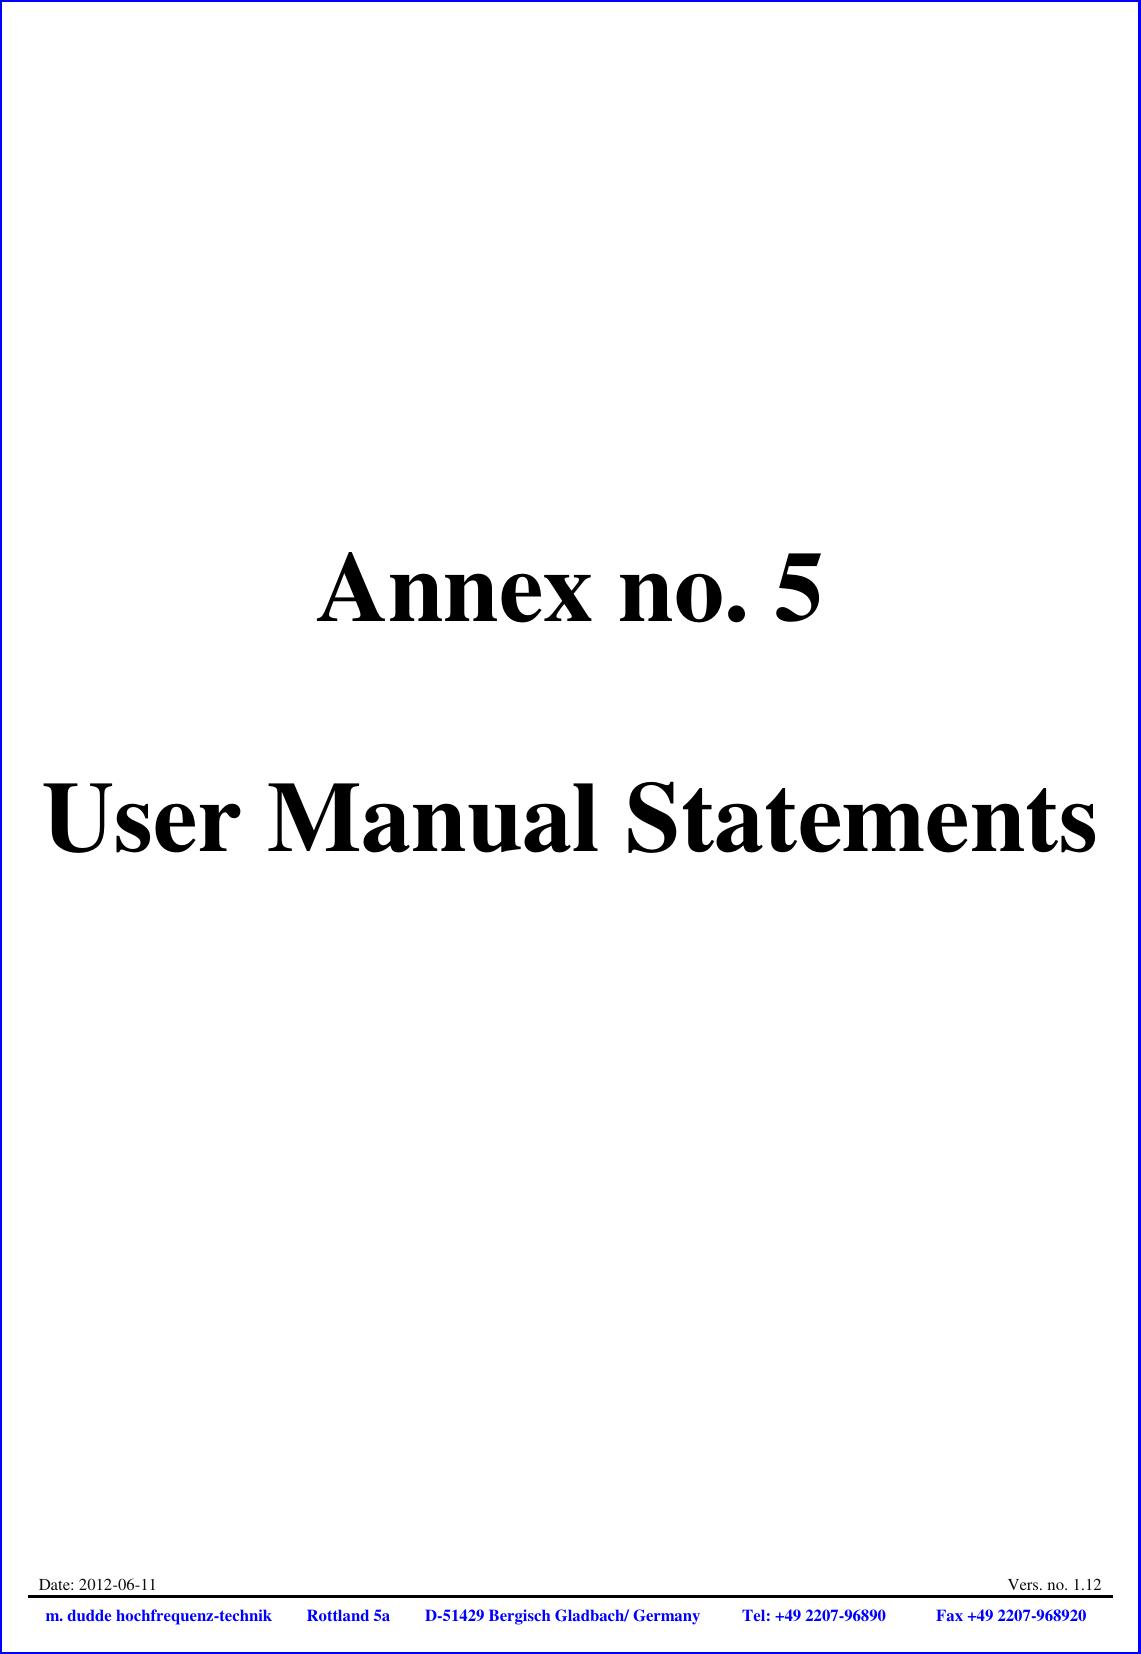 Continental Automotive V2X Transmitter User Manual Annex No